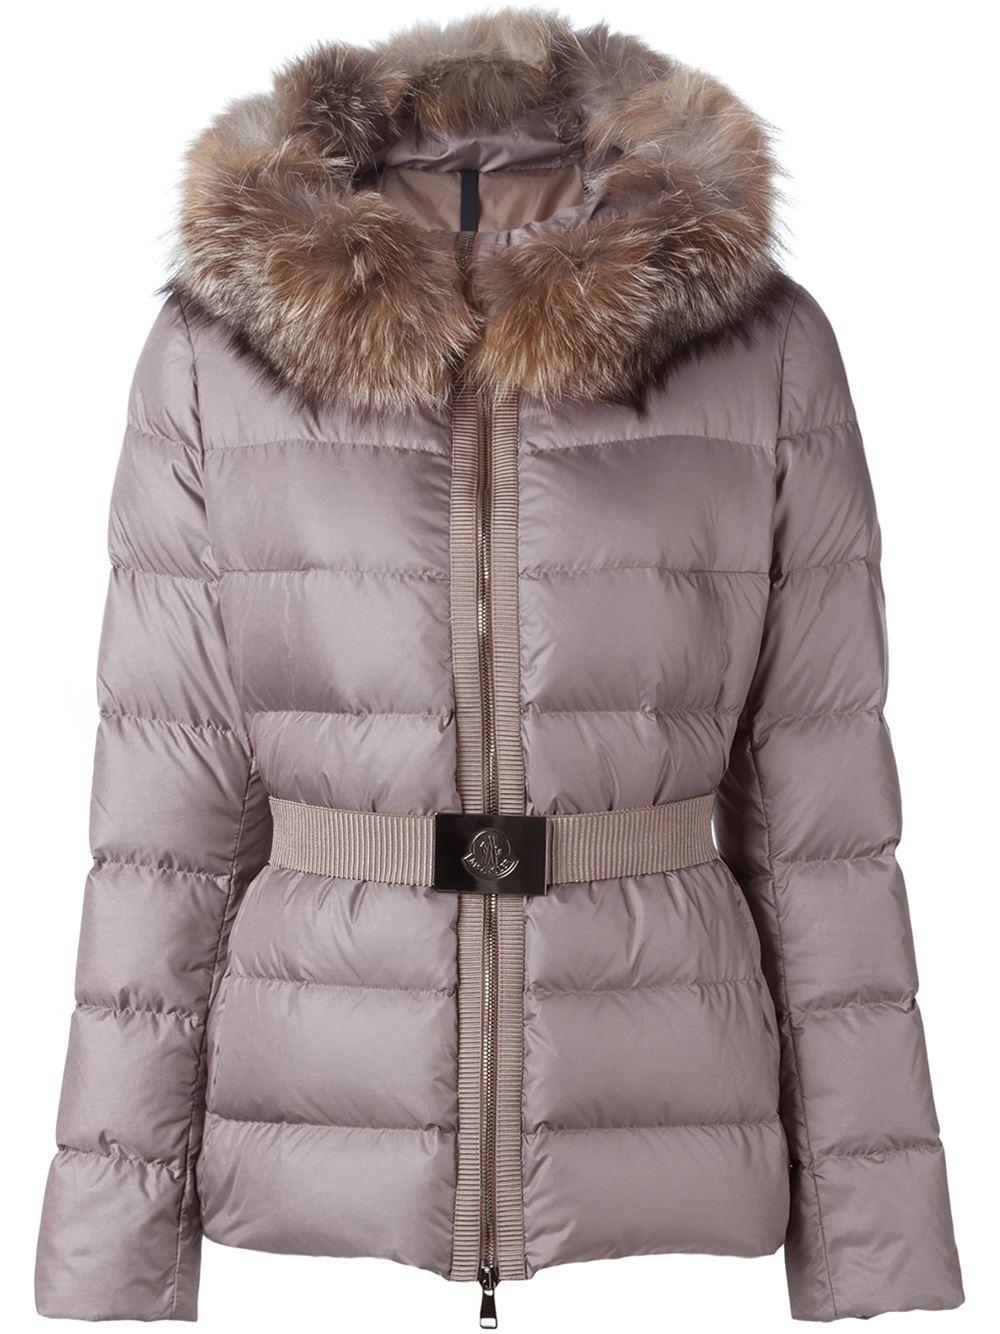 moncler Coats BEIGE